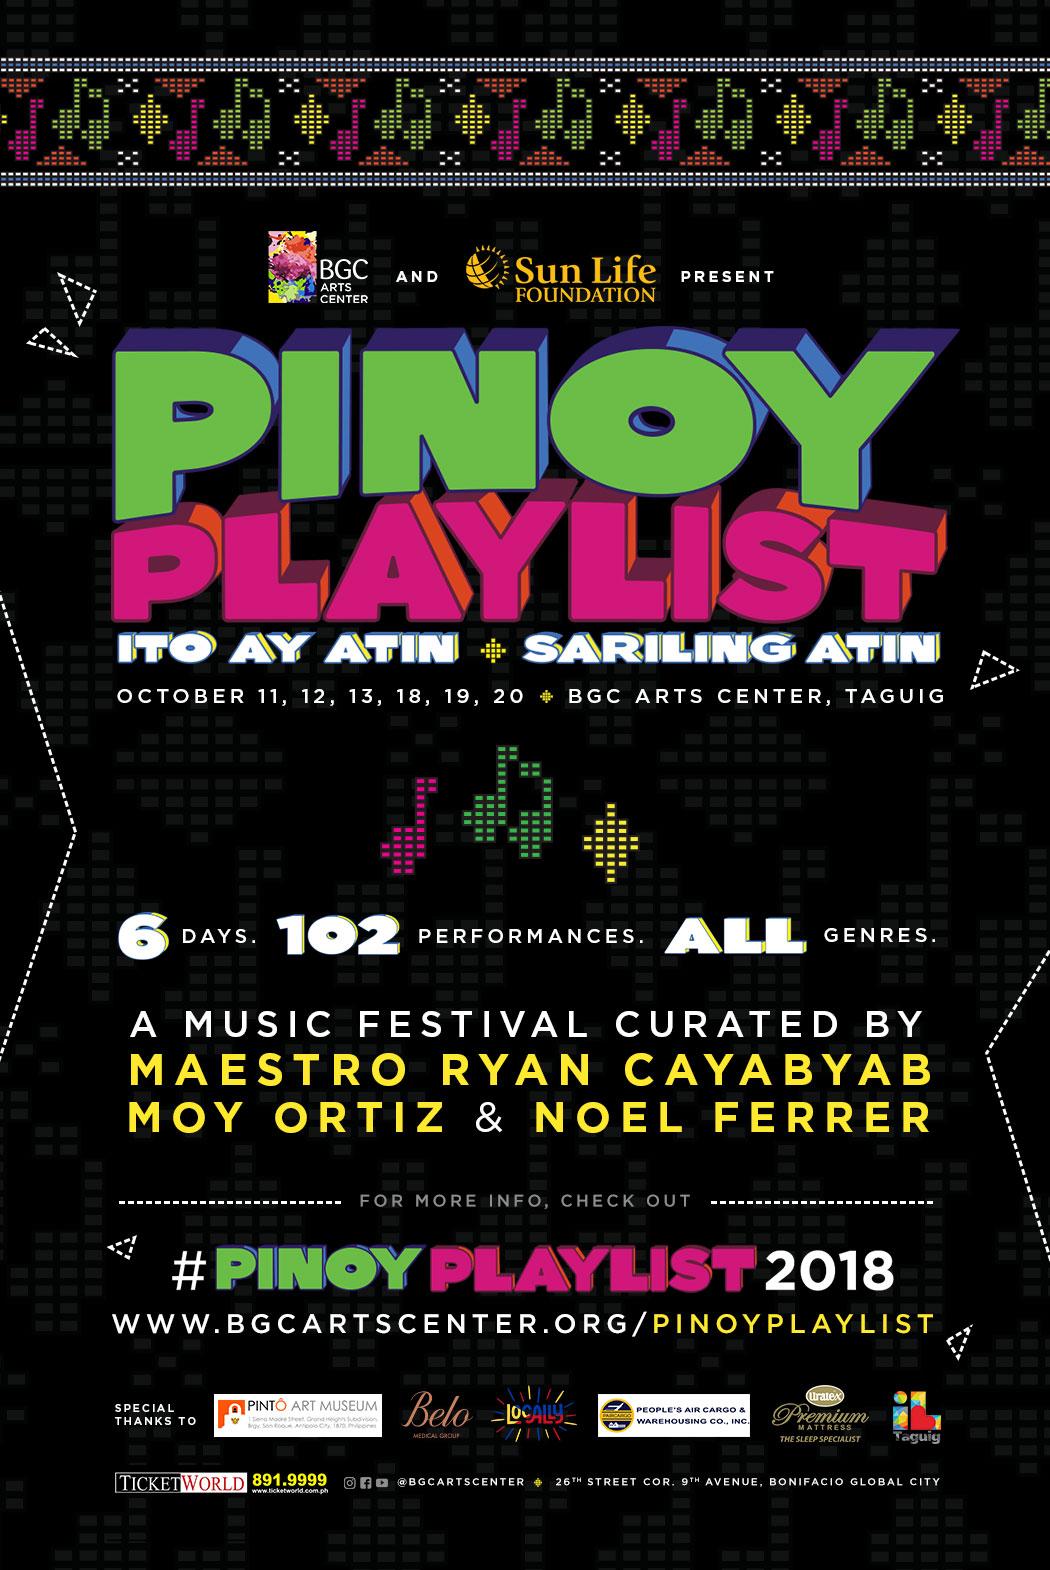 Pinoy Playlist Ito ay Atin • Sariling Atin